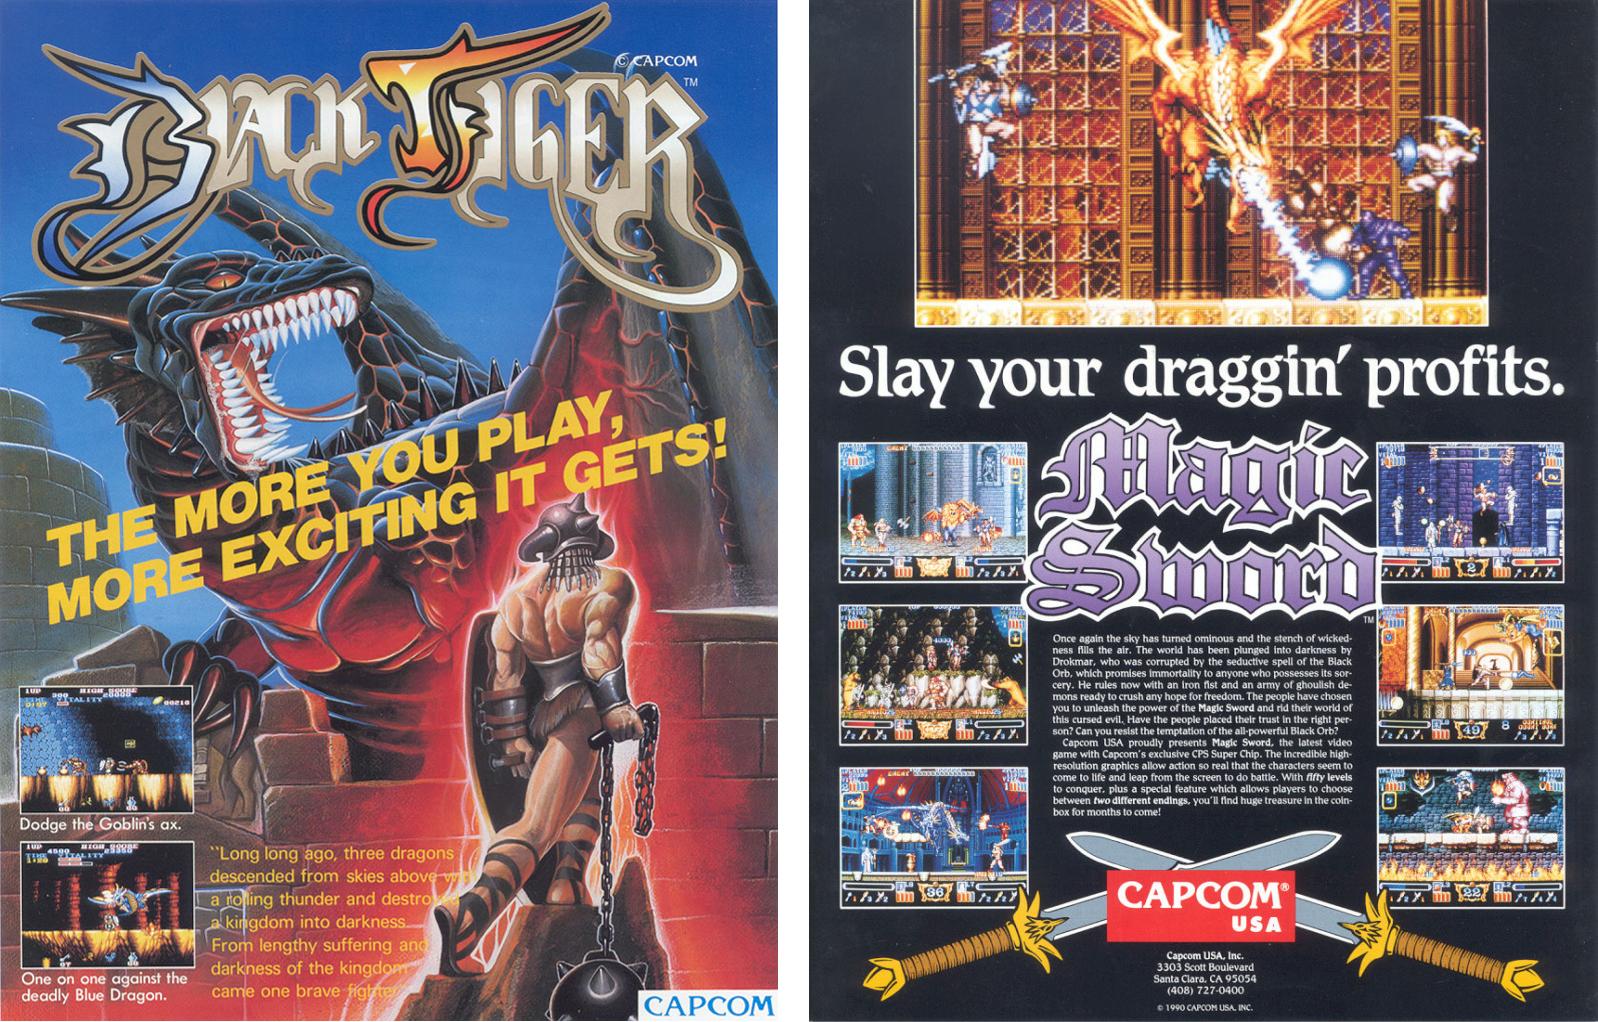 black-tiger-es-magic-sword-arcade-flyer-.jpg